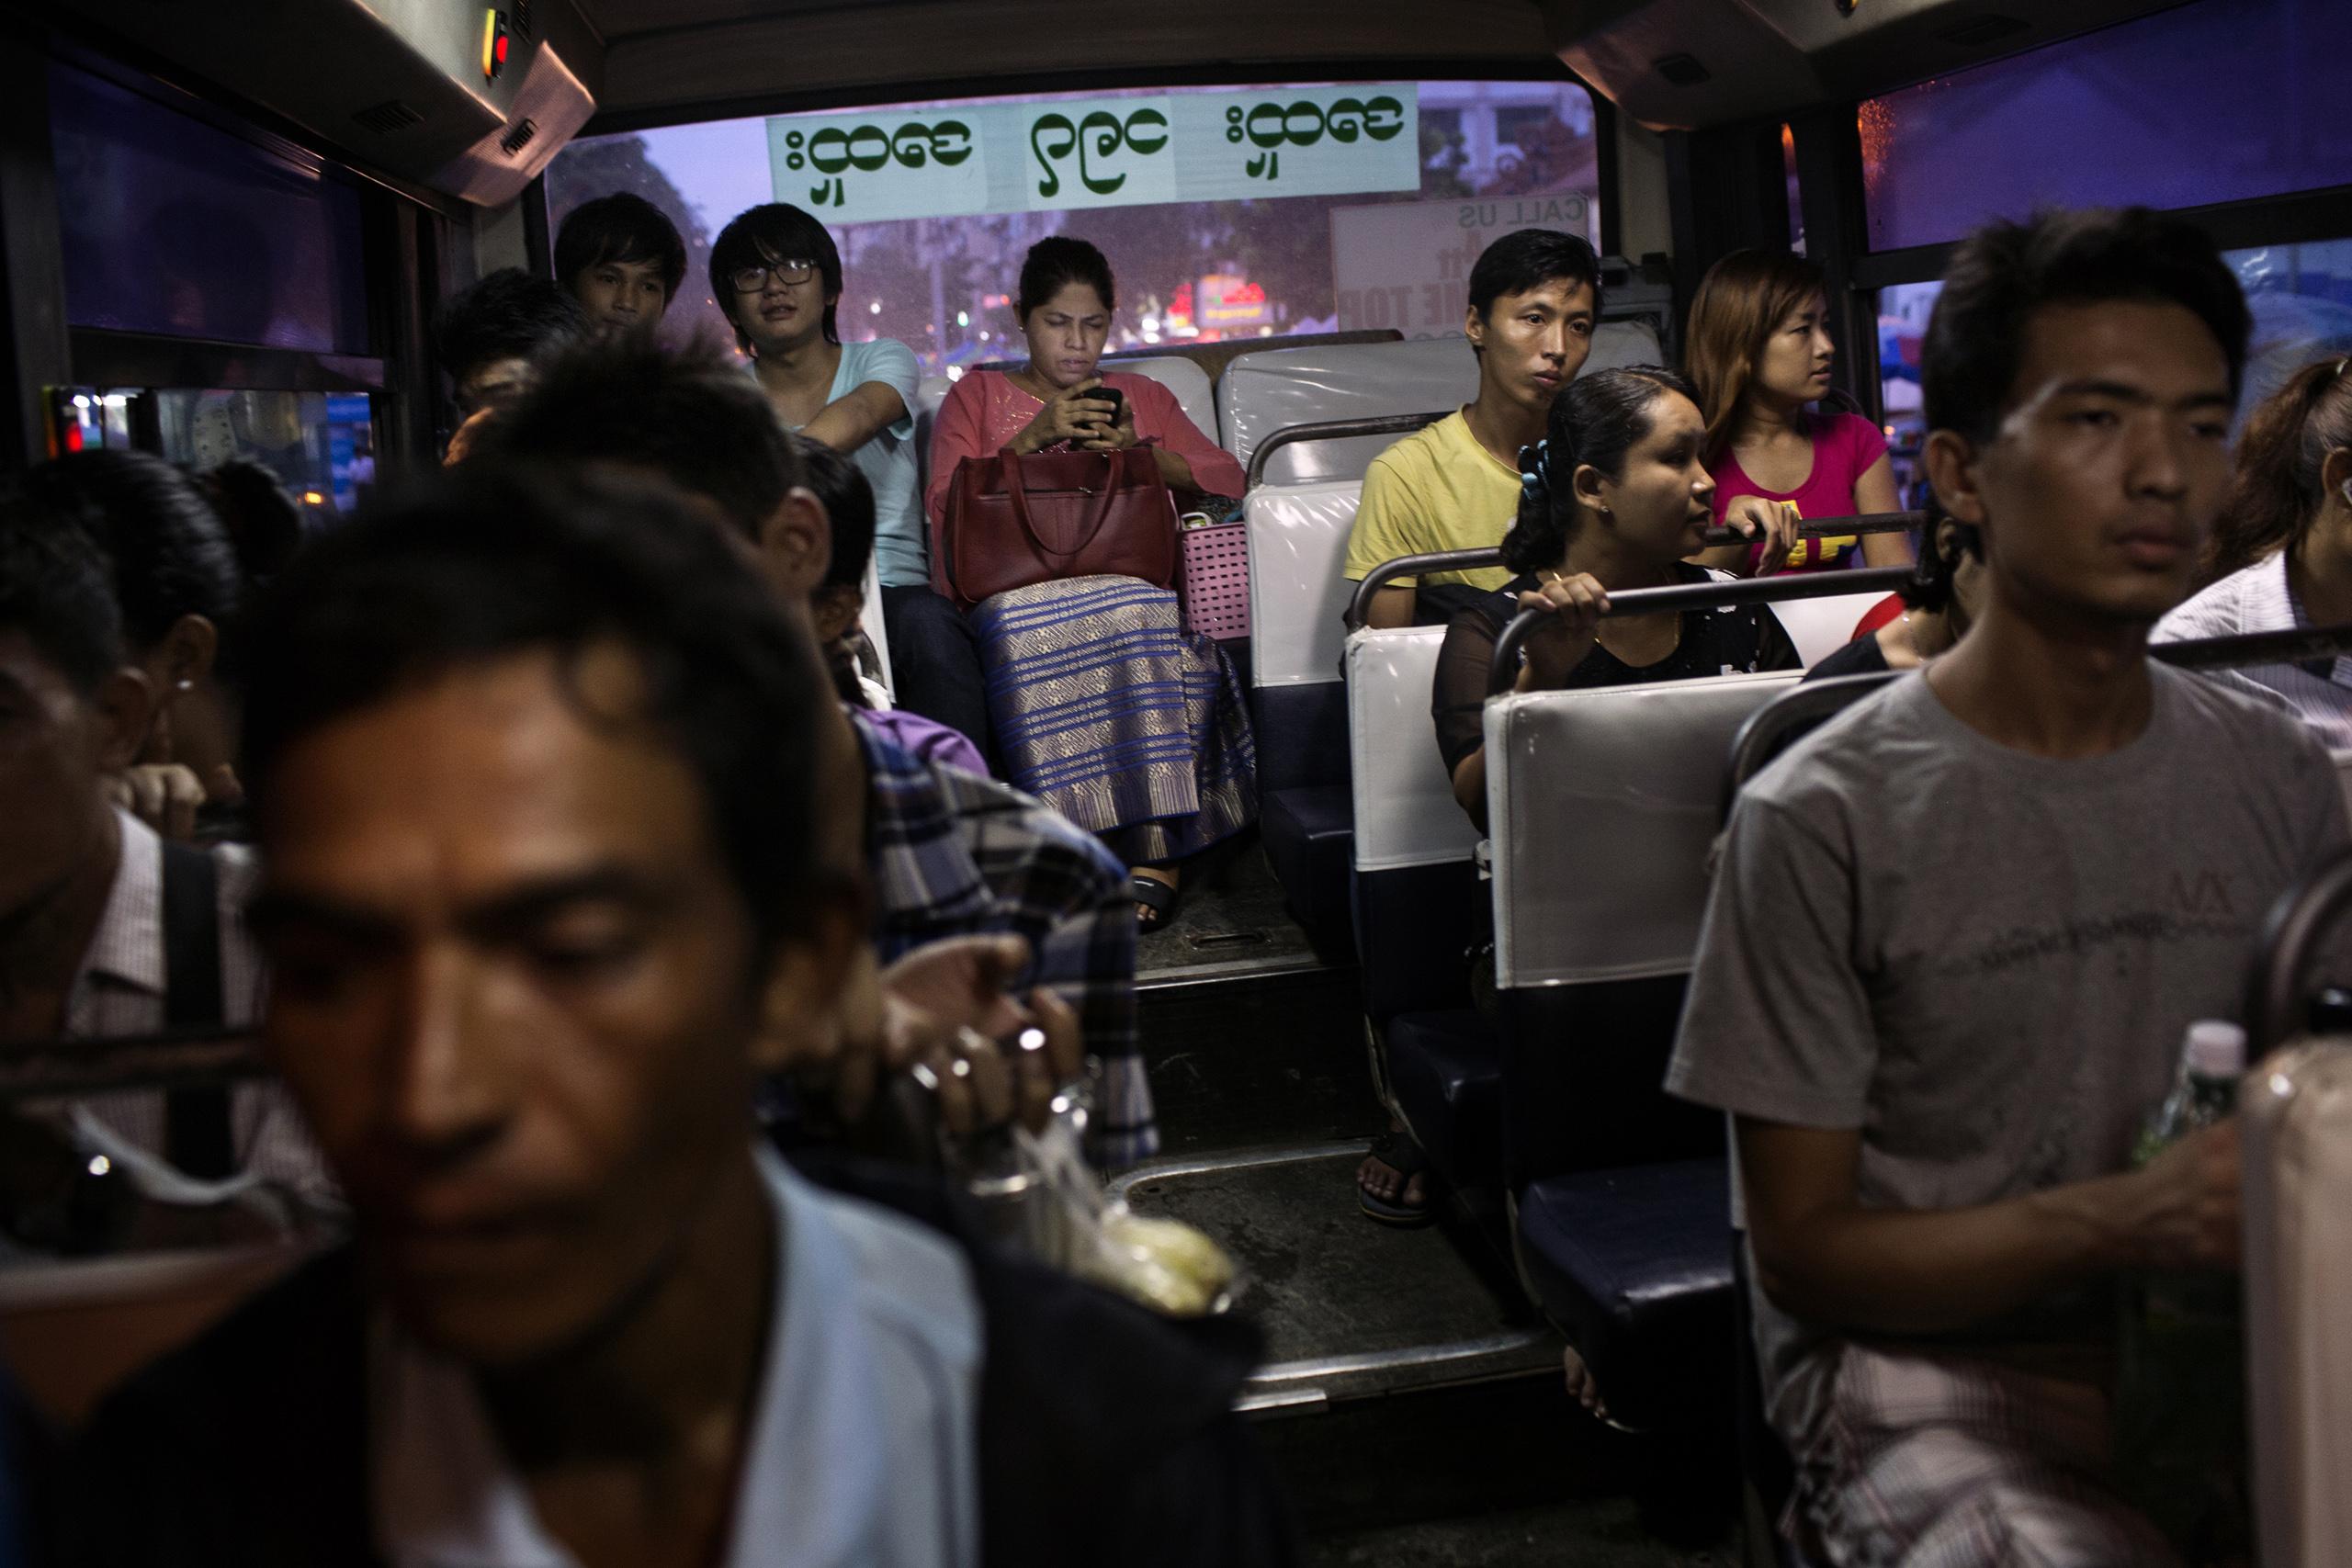 Passengers, some using smart phones, ride a bus in Yangon, Burma, June 21, 2014.